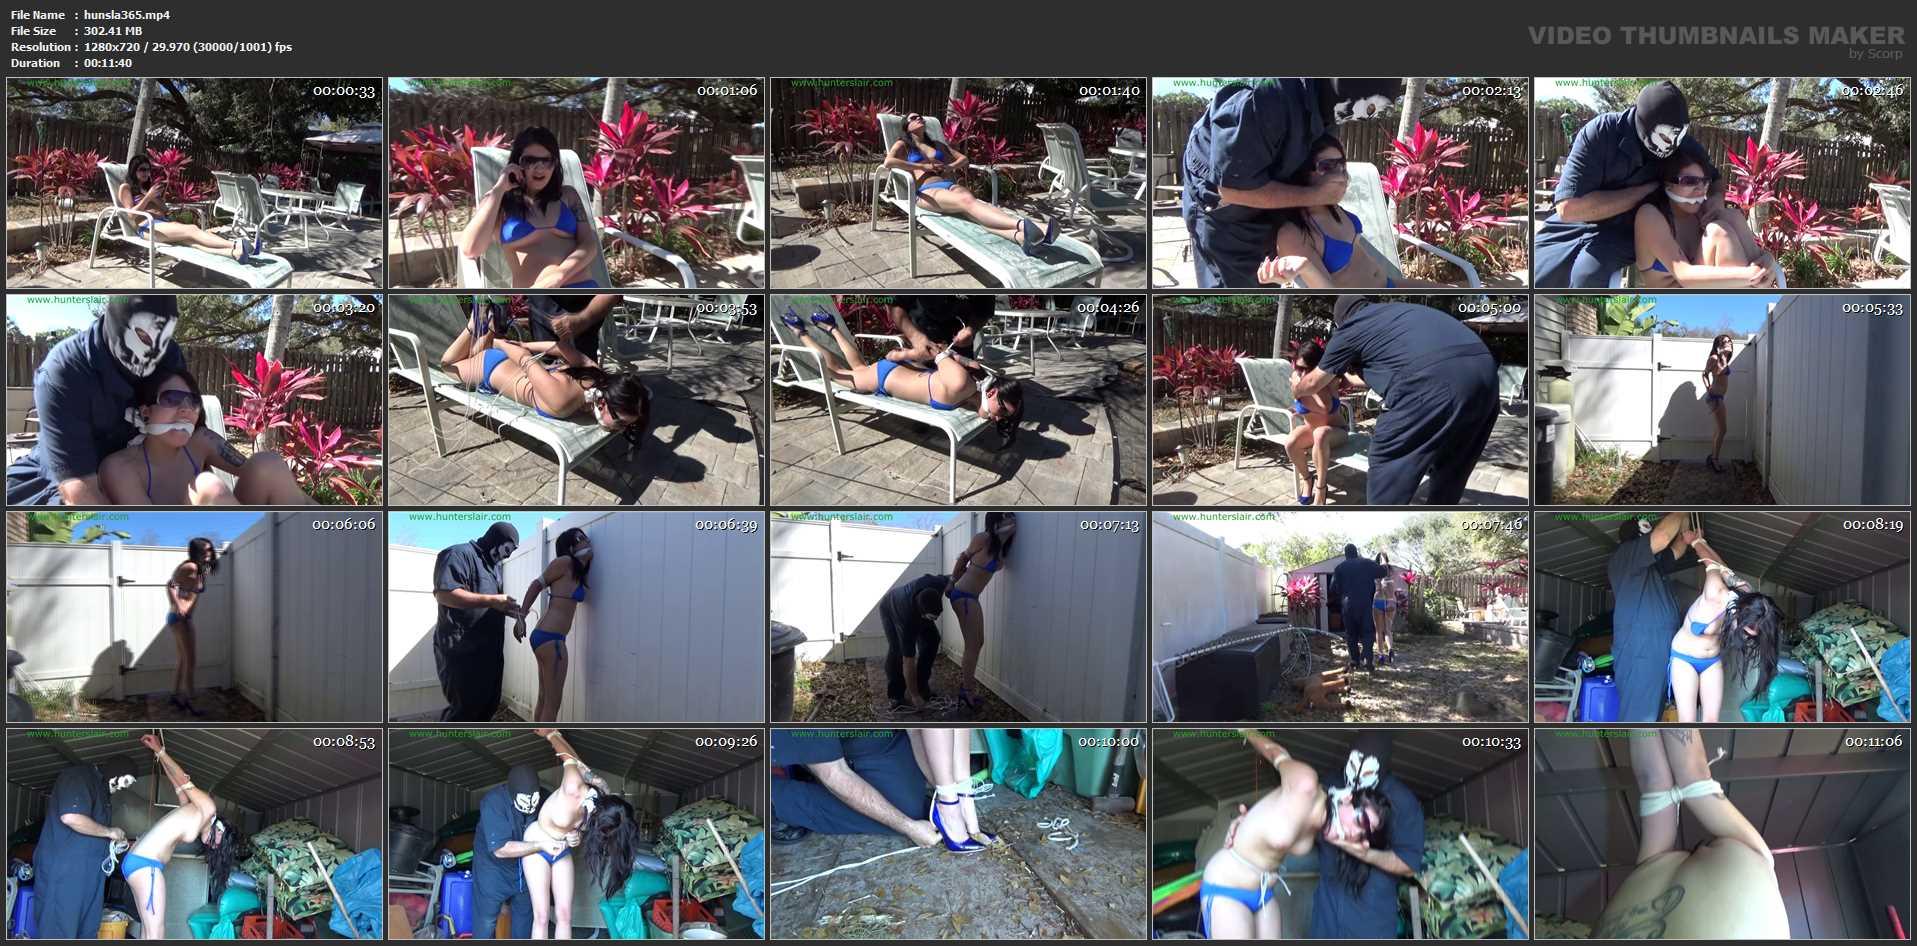 [HUNTERSLAIR] Spring break terror for the bikini clad coed. Featuring: Raquel Roper [HD][720p][MP4]